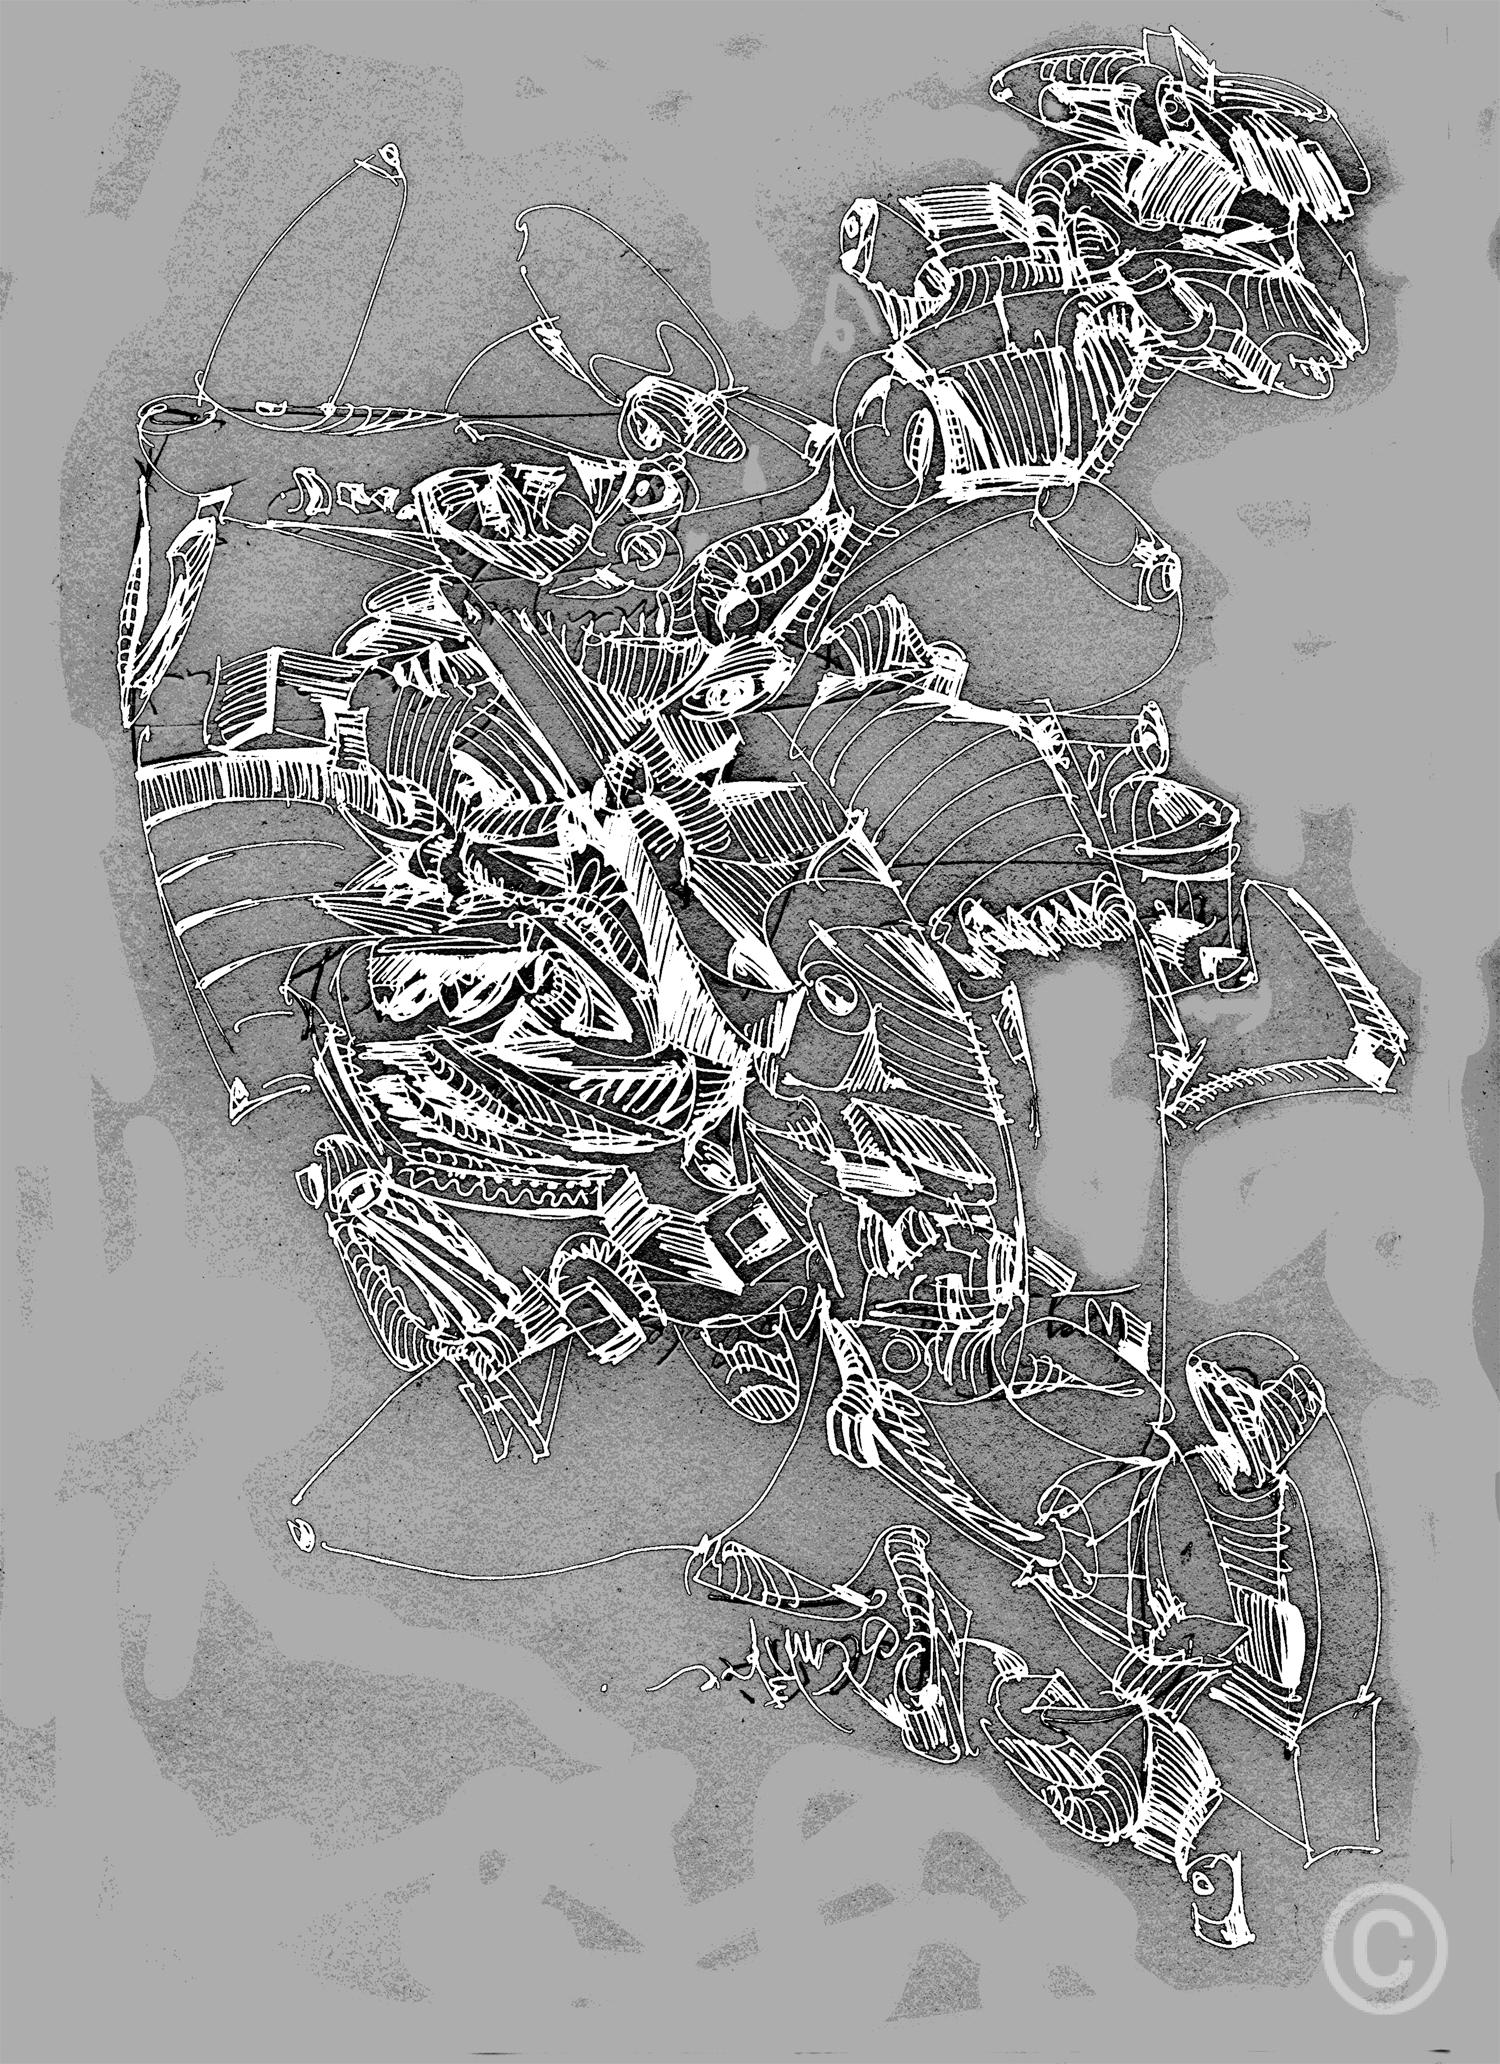 Transgenerational Drawing Mixed digital media © Prosper Jerominus, 2017